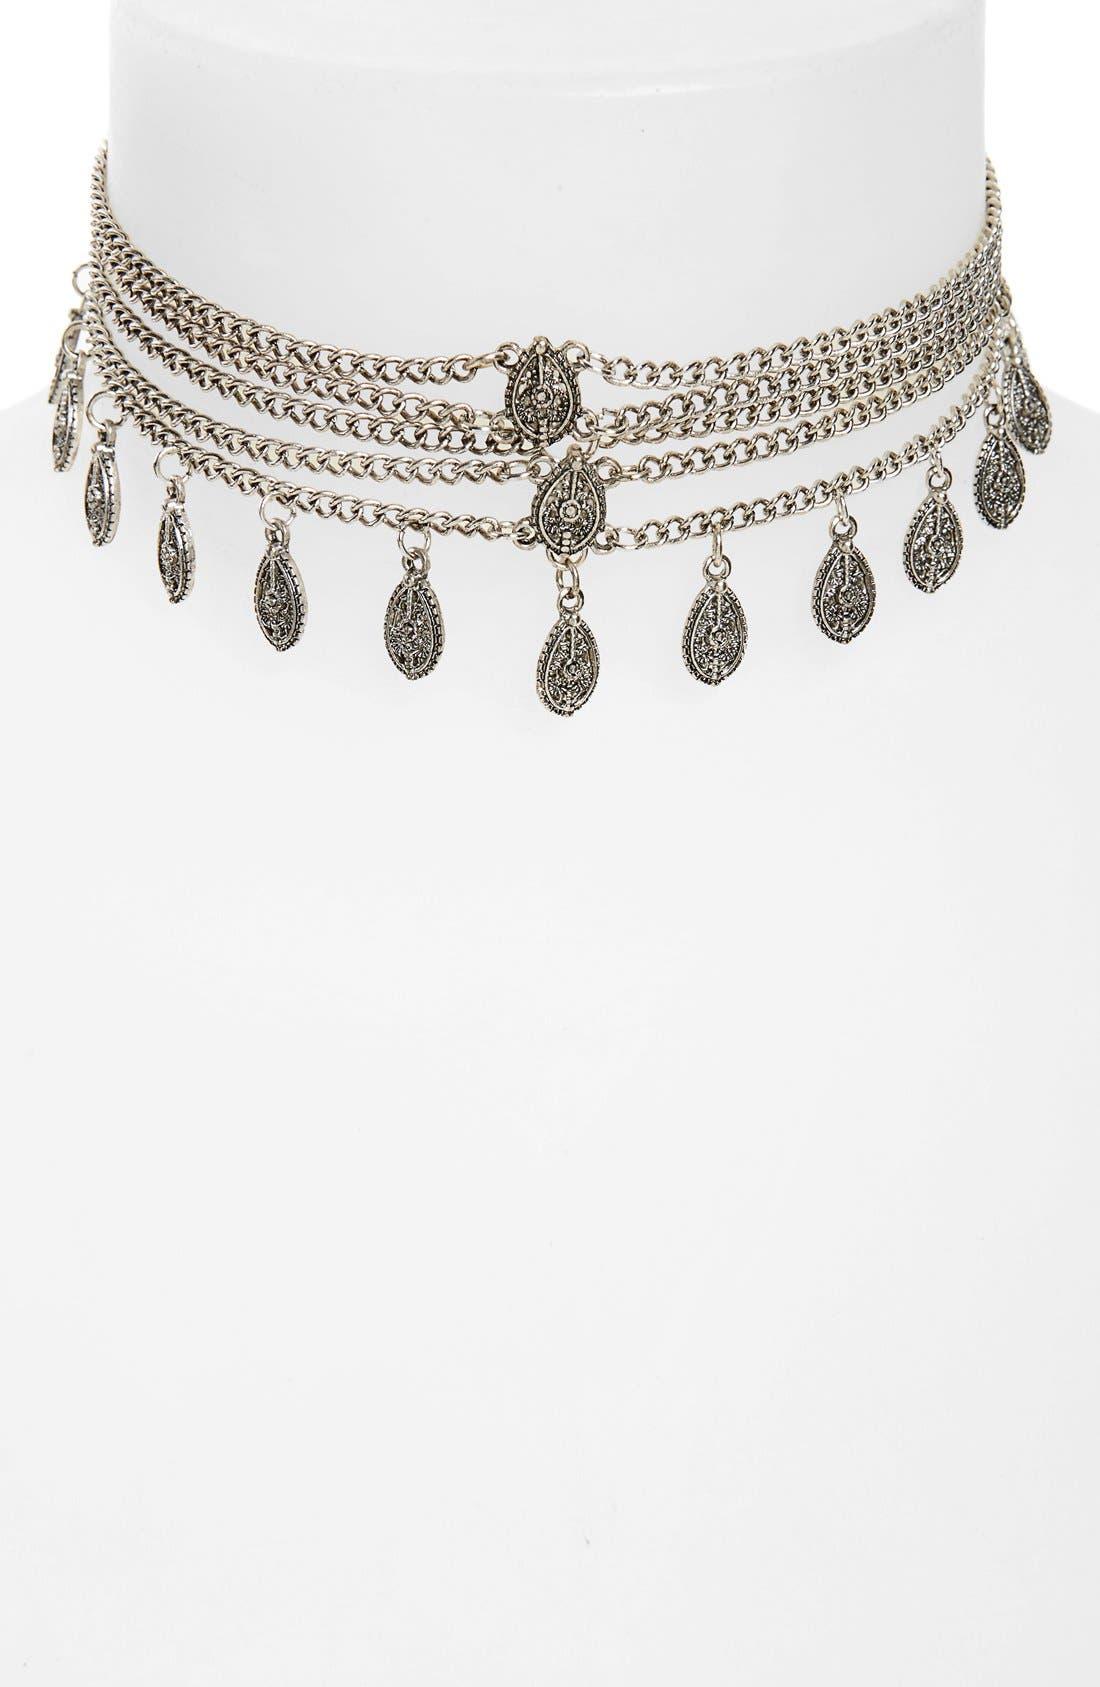 Alternate Image 1 Selected - Loren Olivia Multistrand Choker Necklace